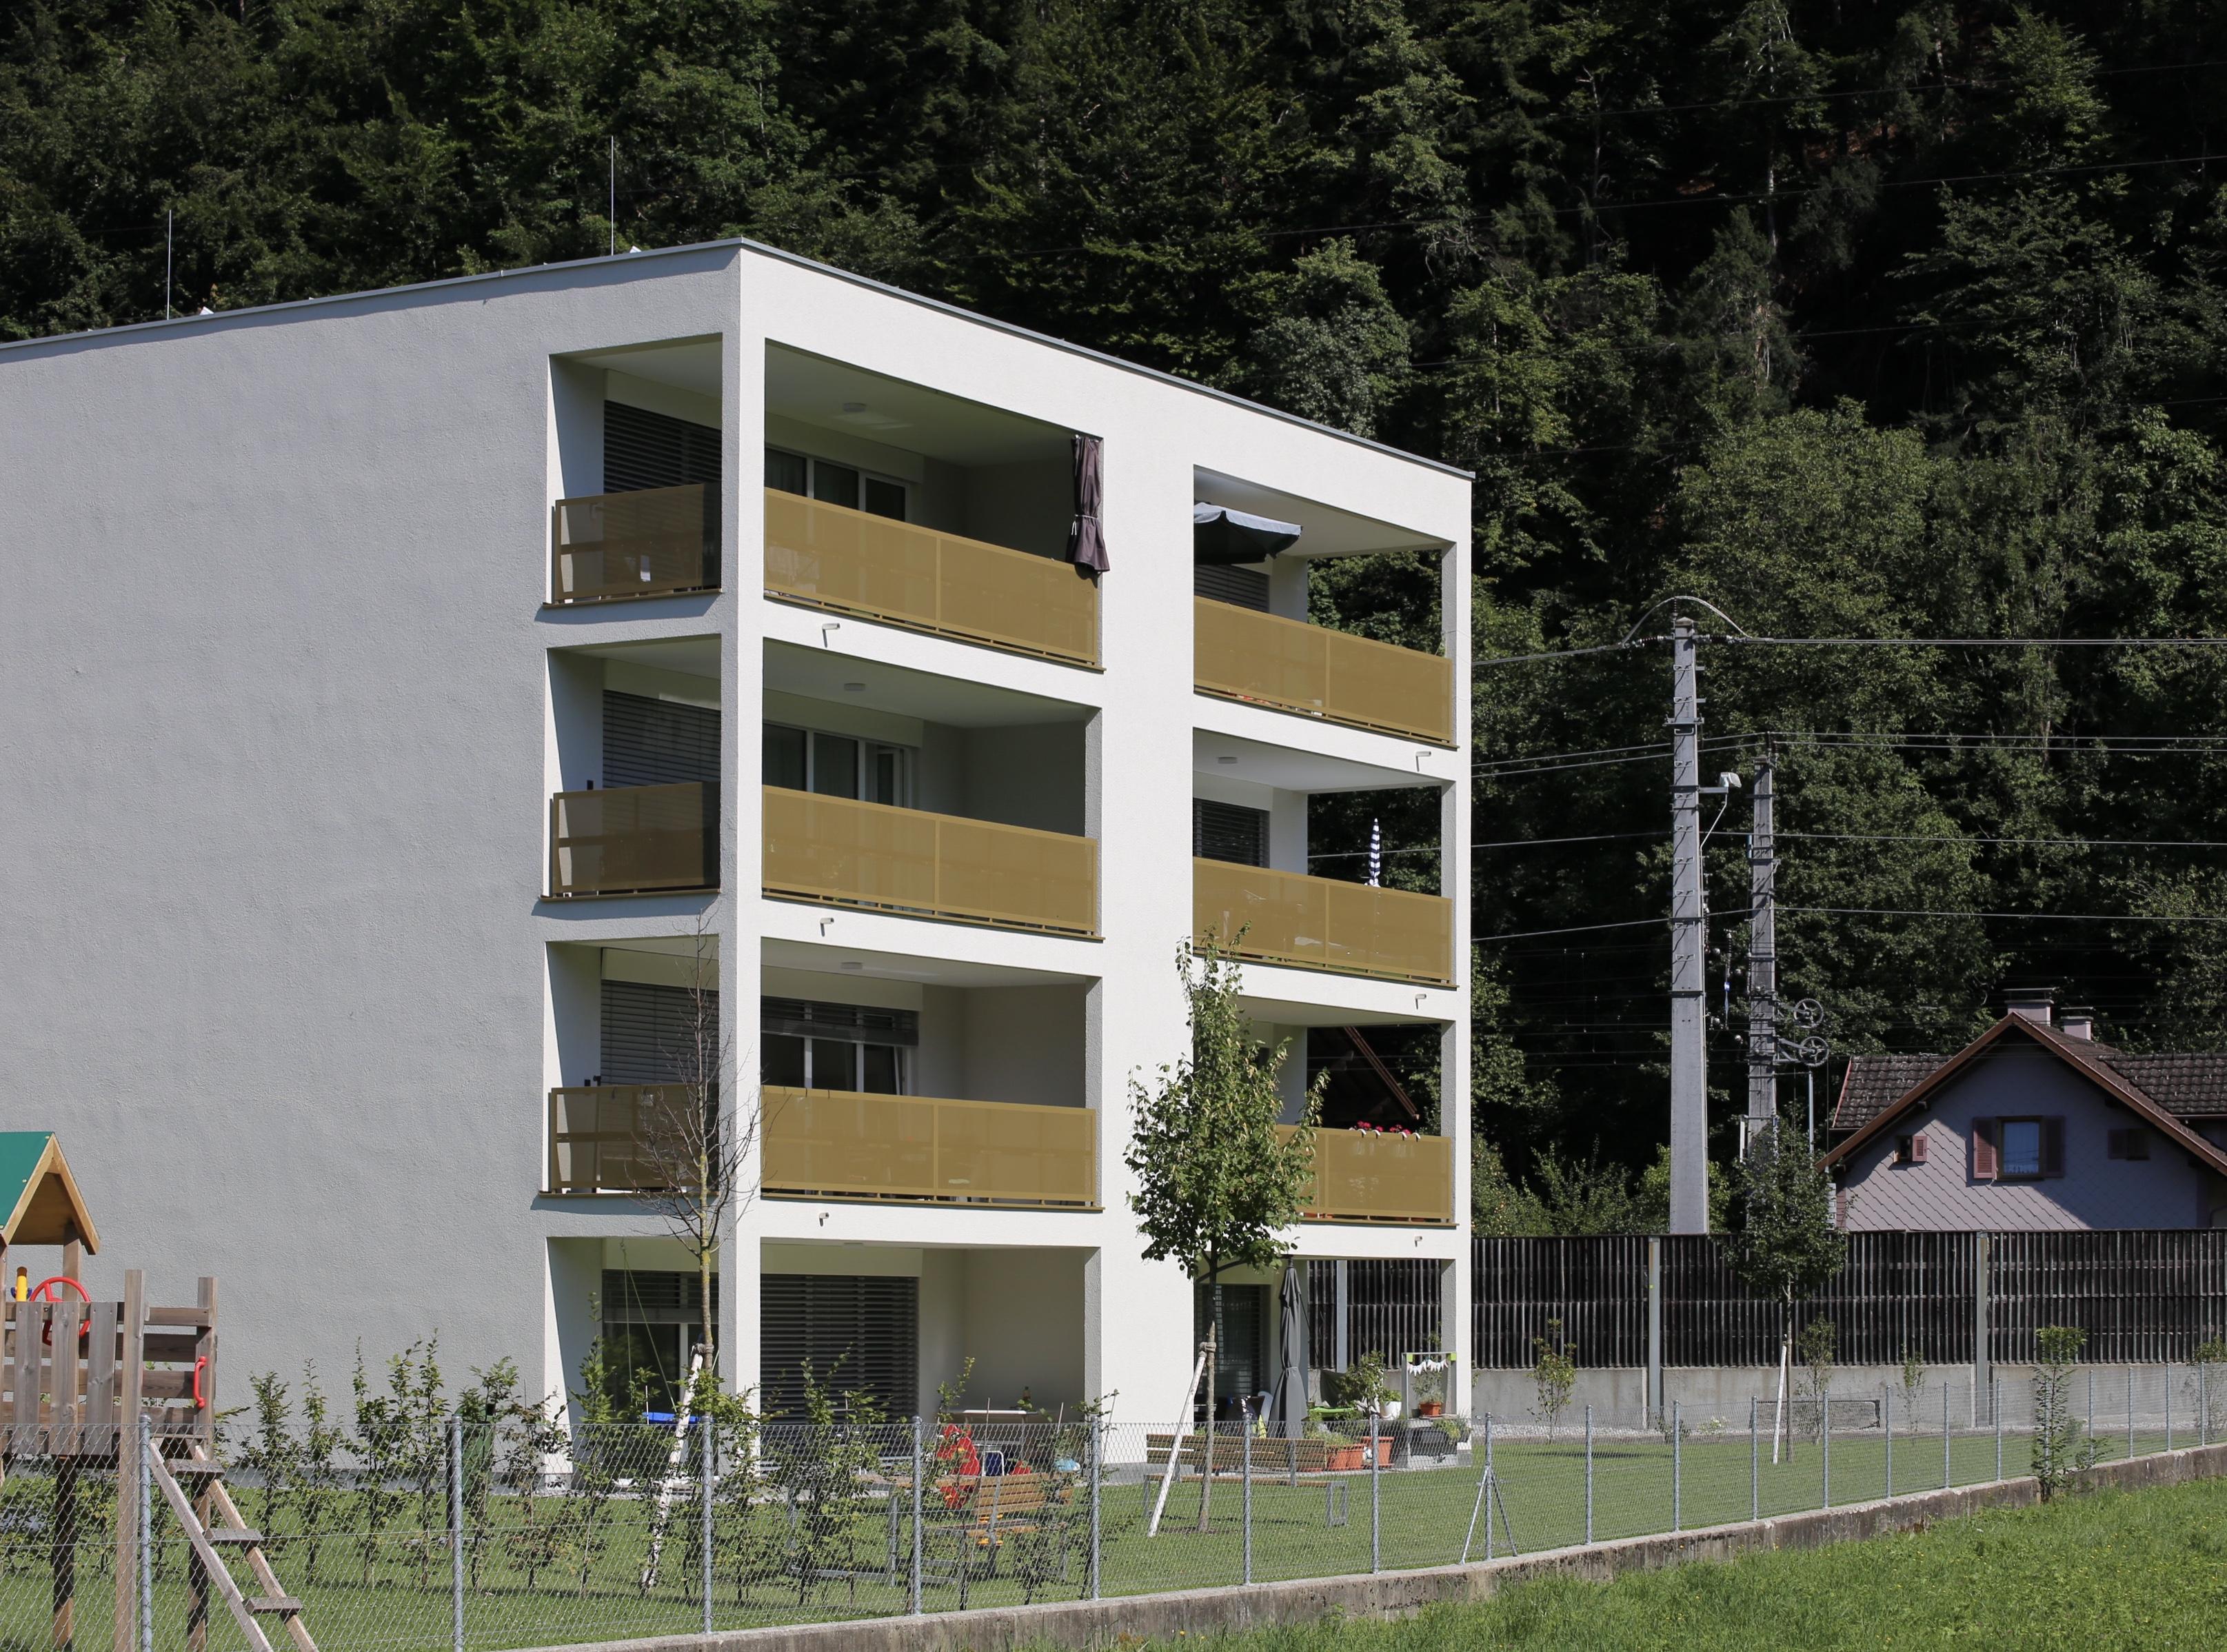 Leistbares Wohnen - Stadt Feldkirch